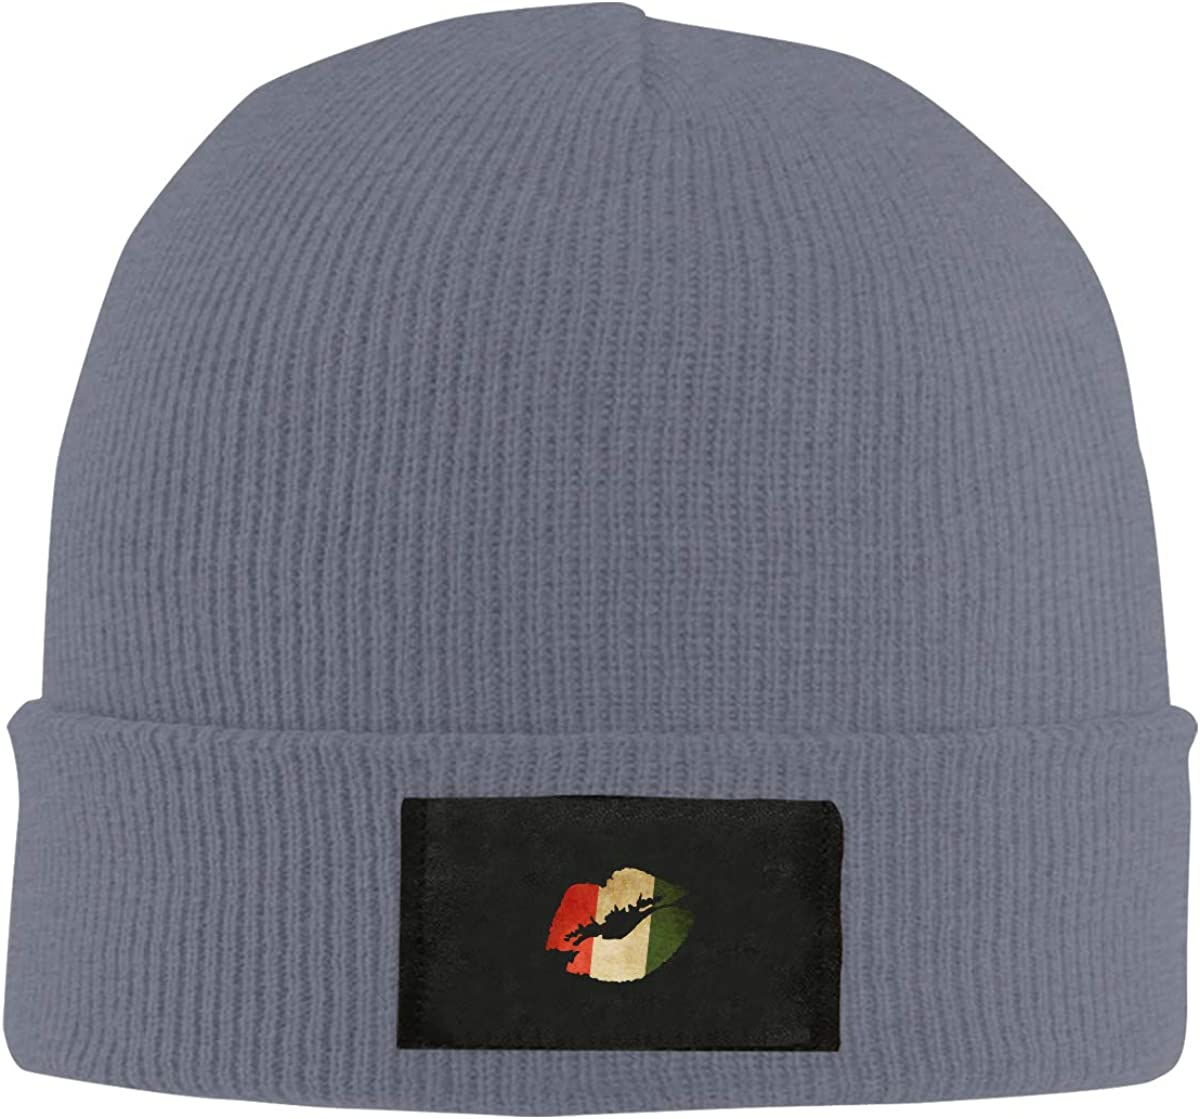 LRHUI Italian Flag Lip Winter Knitted Hat Warm Wool Skull Beanie Cap